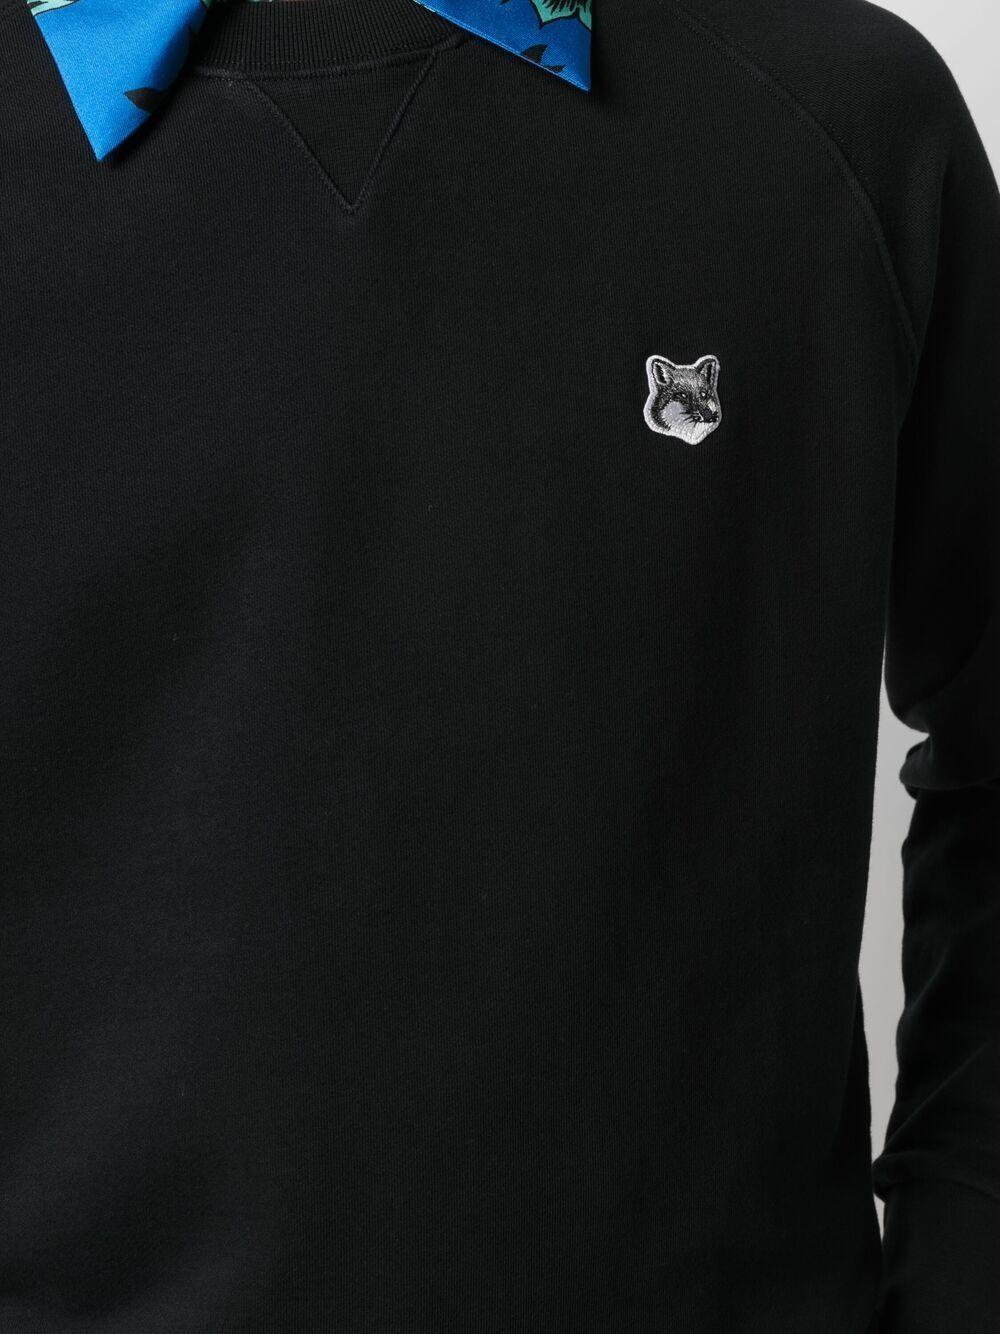 felpa con logo uomo nera in cotone MAISON KITSUNÉ   Felpe   GM00333KM0002P199